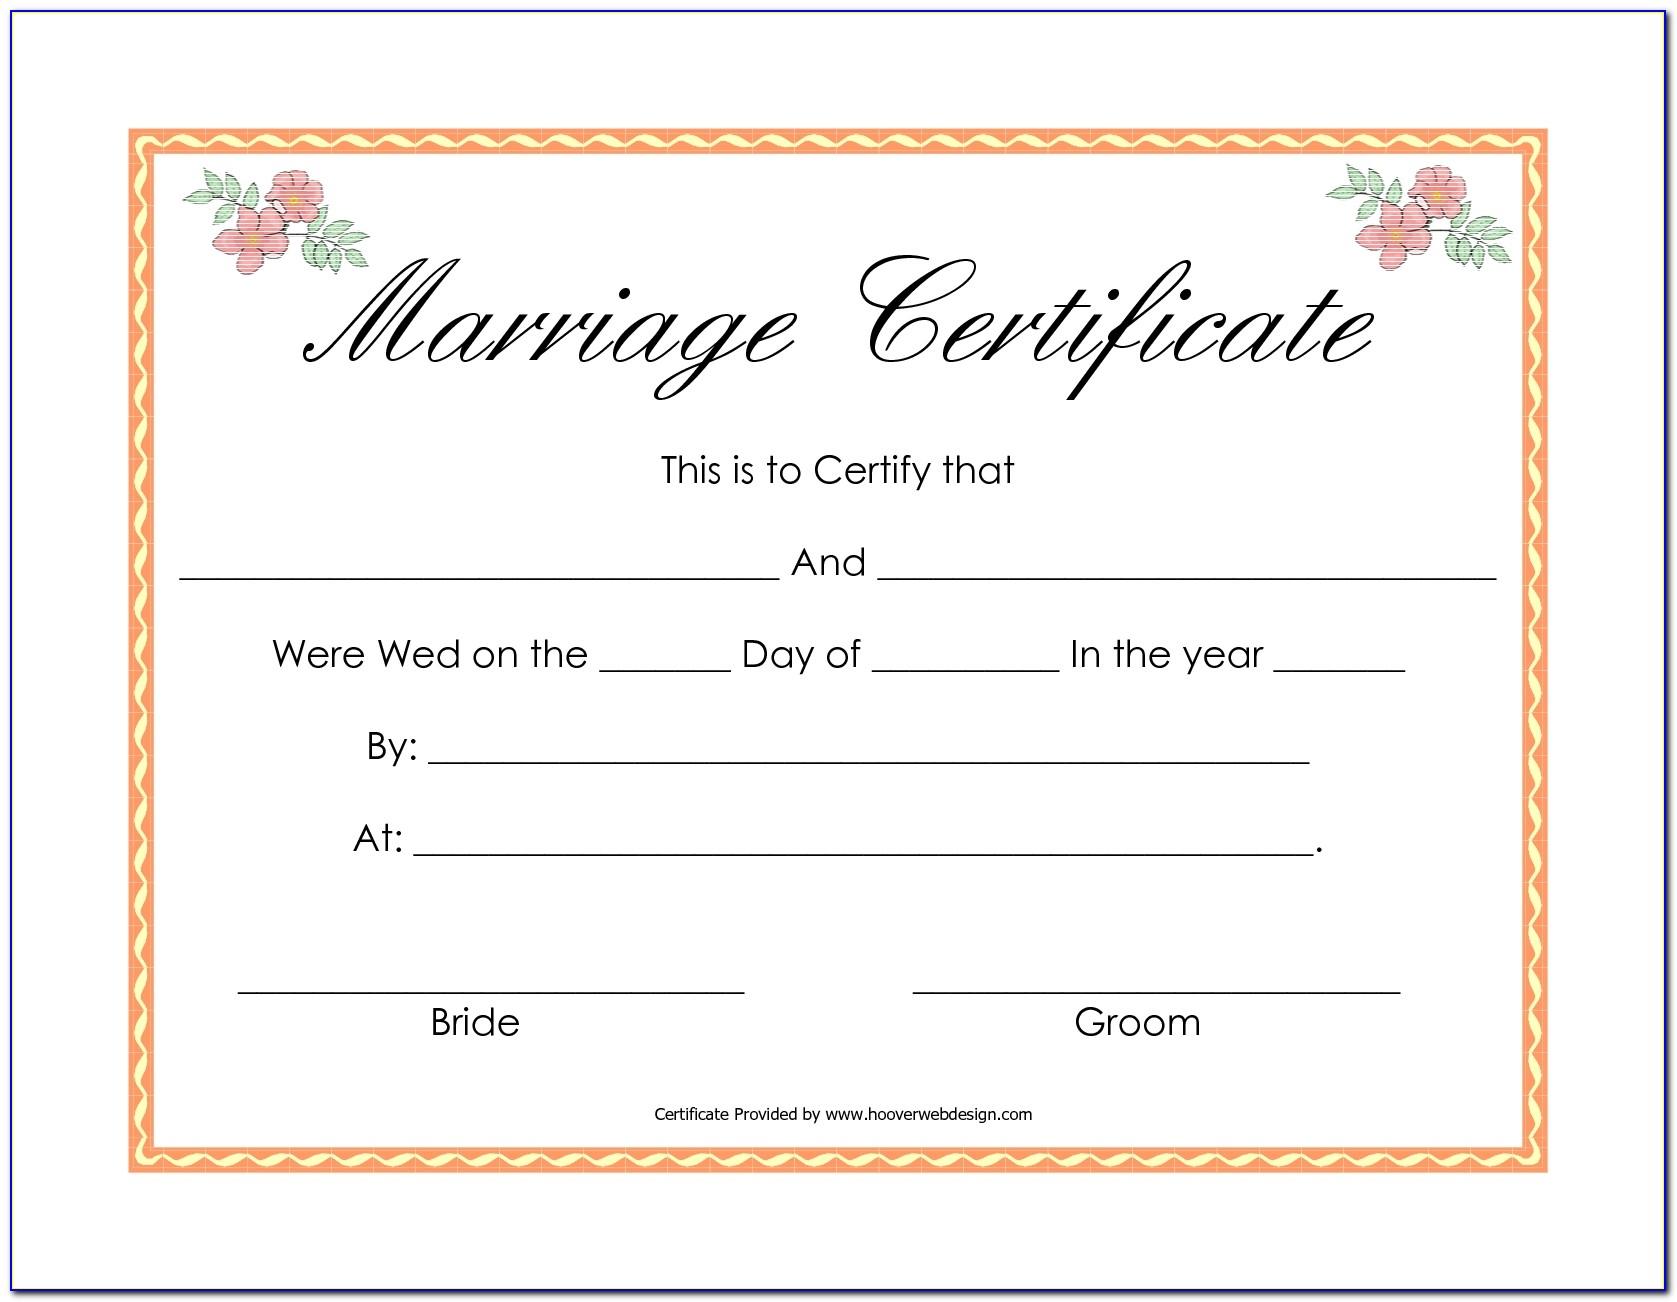 Duplicate Birth Certificate Panchkula